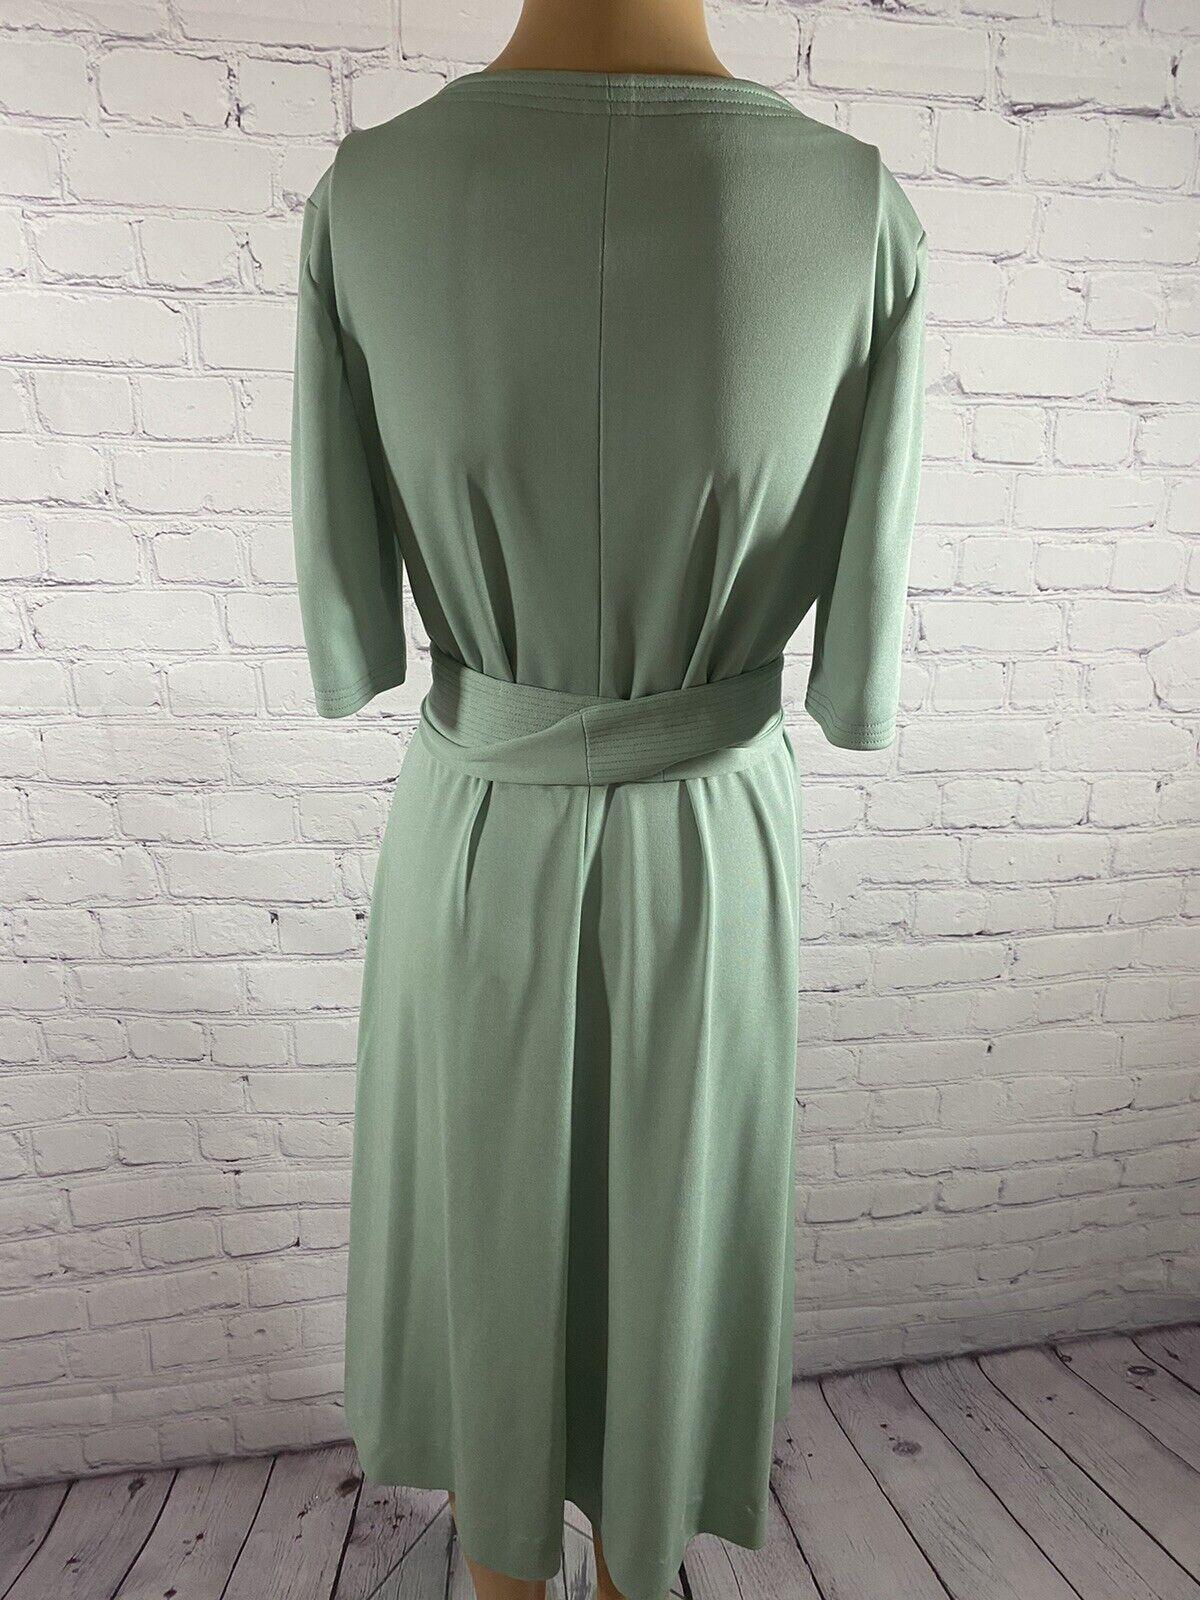 Vintage 70's Mint Green Disco/Secretary Dress - image 3